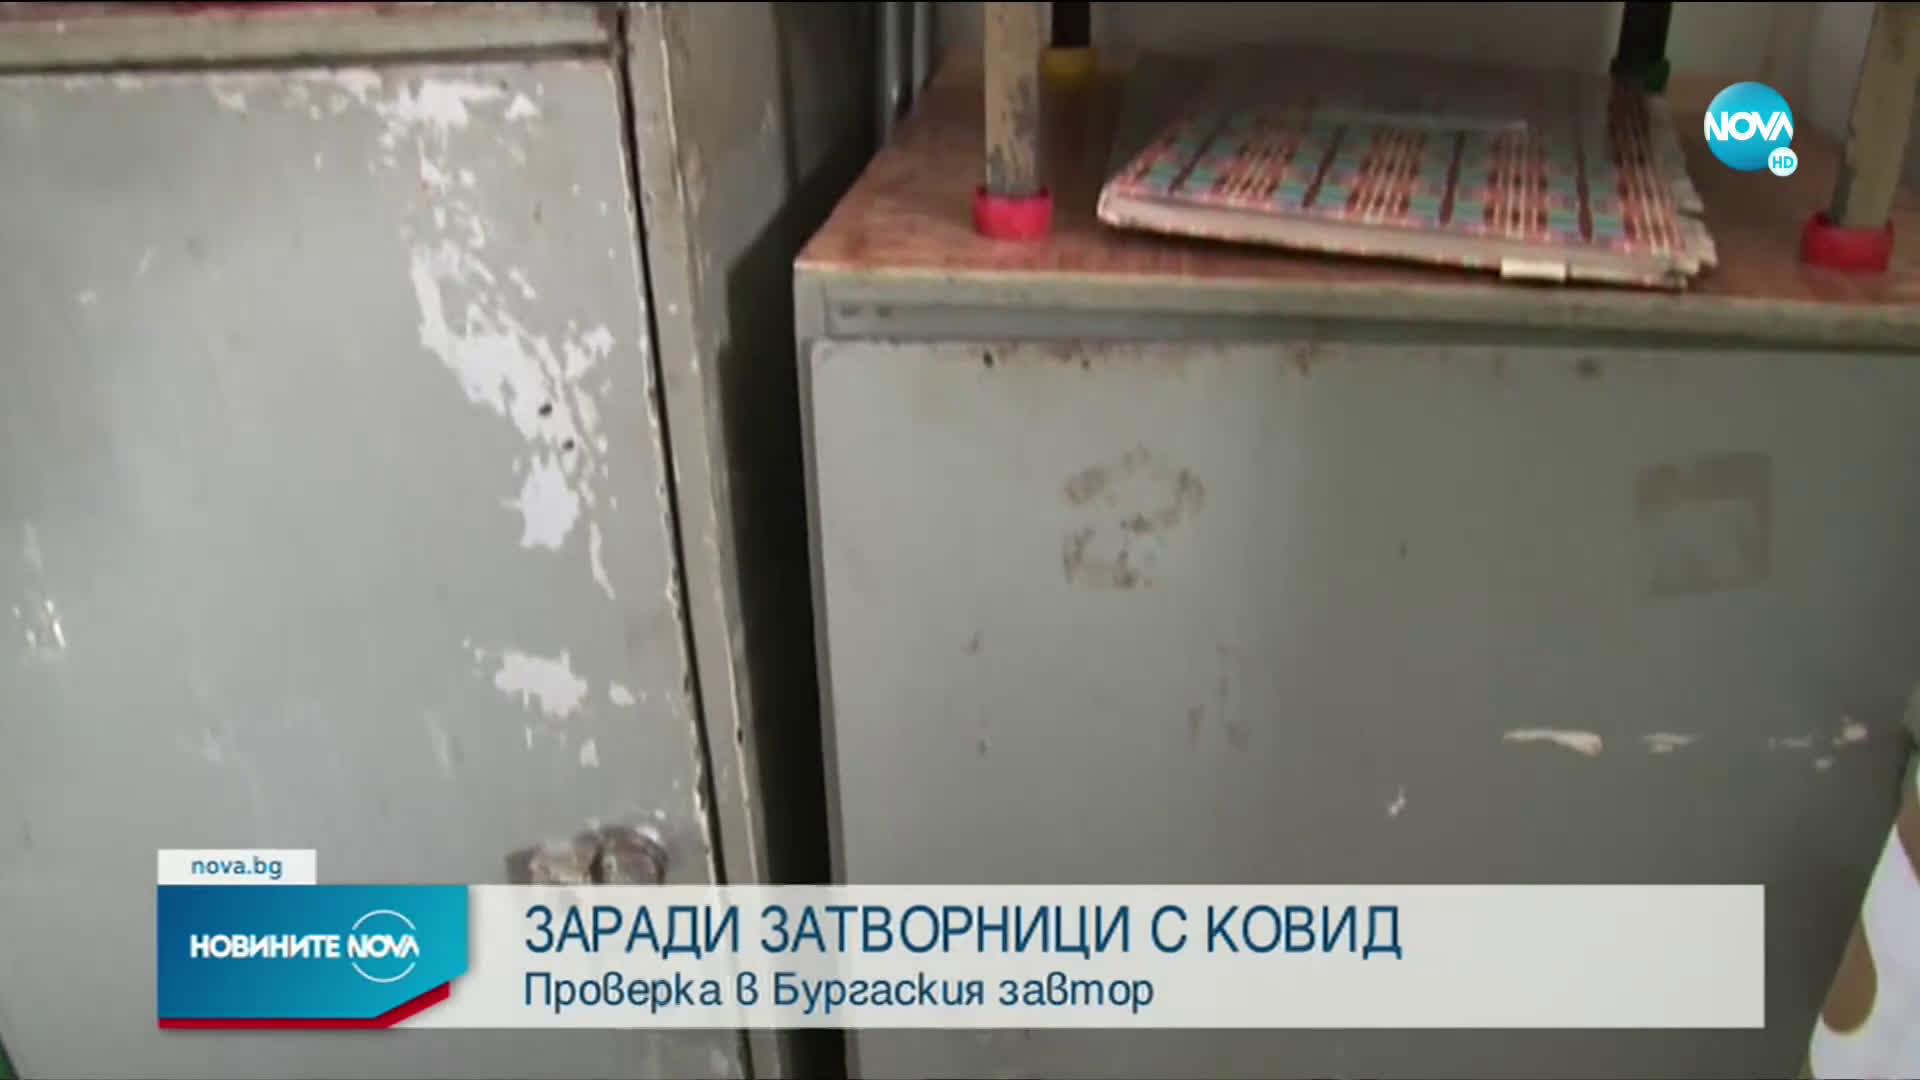 Назначиха проверка в Бургаския затвор заради сигнал за COVID огнище